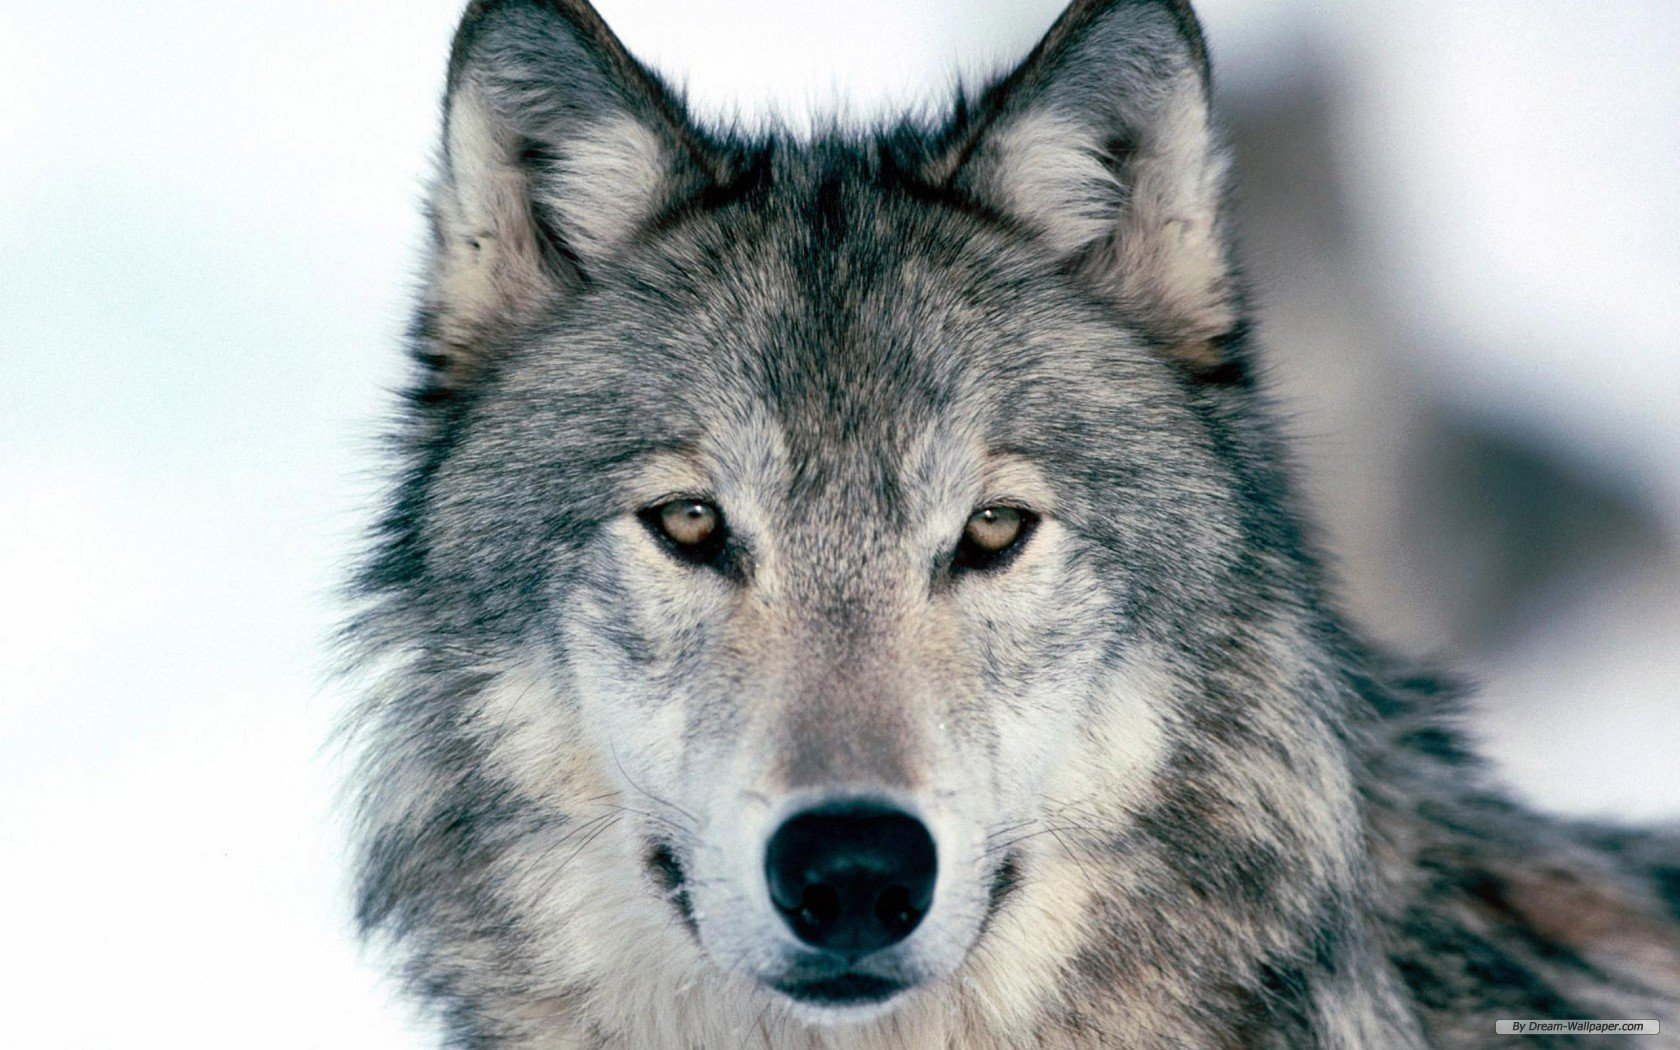 free wallpaper free animal wallpaper wolf wallpaper 1680x1050 - Animal Pictures To Print Free